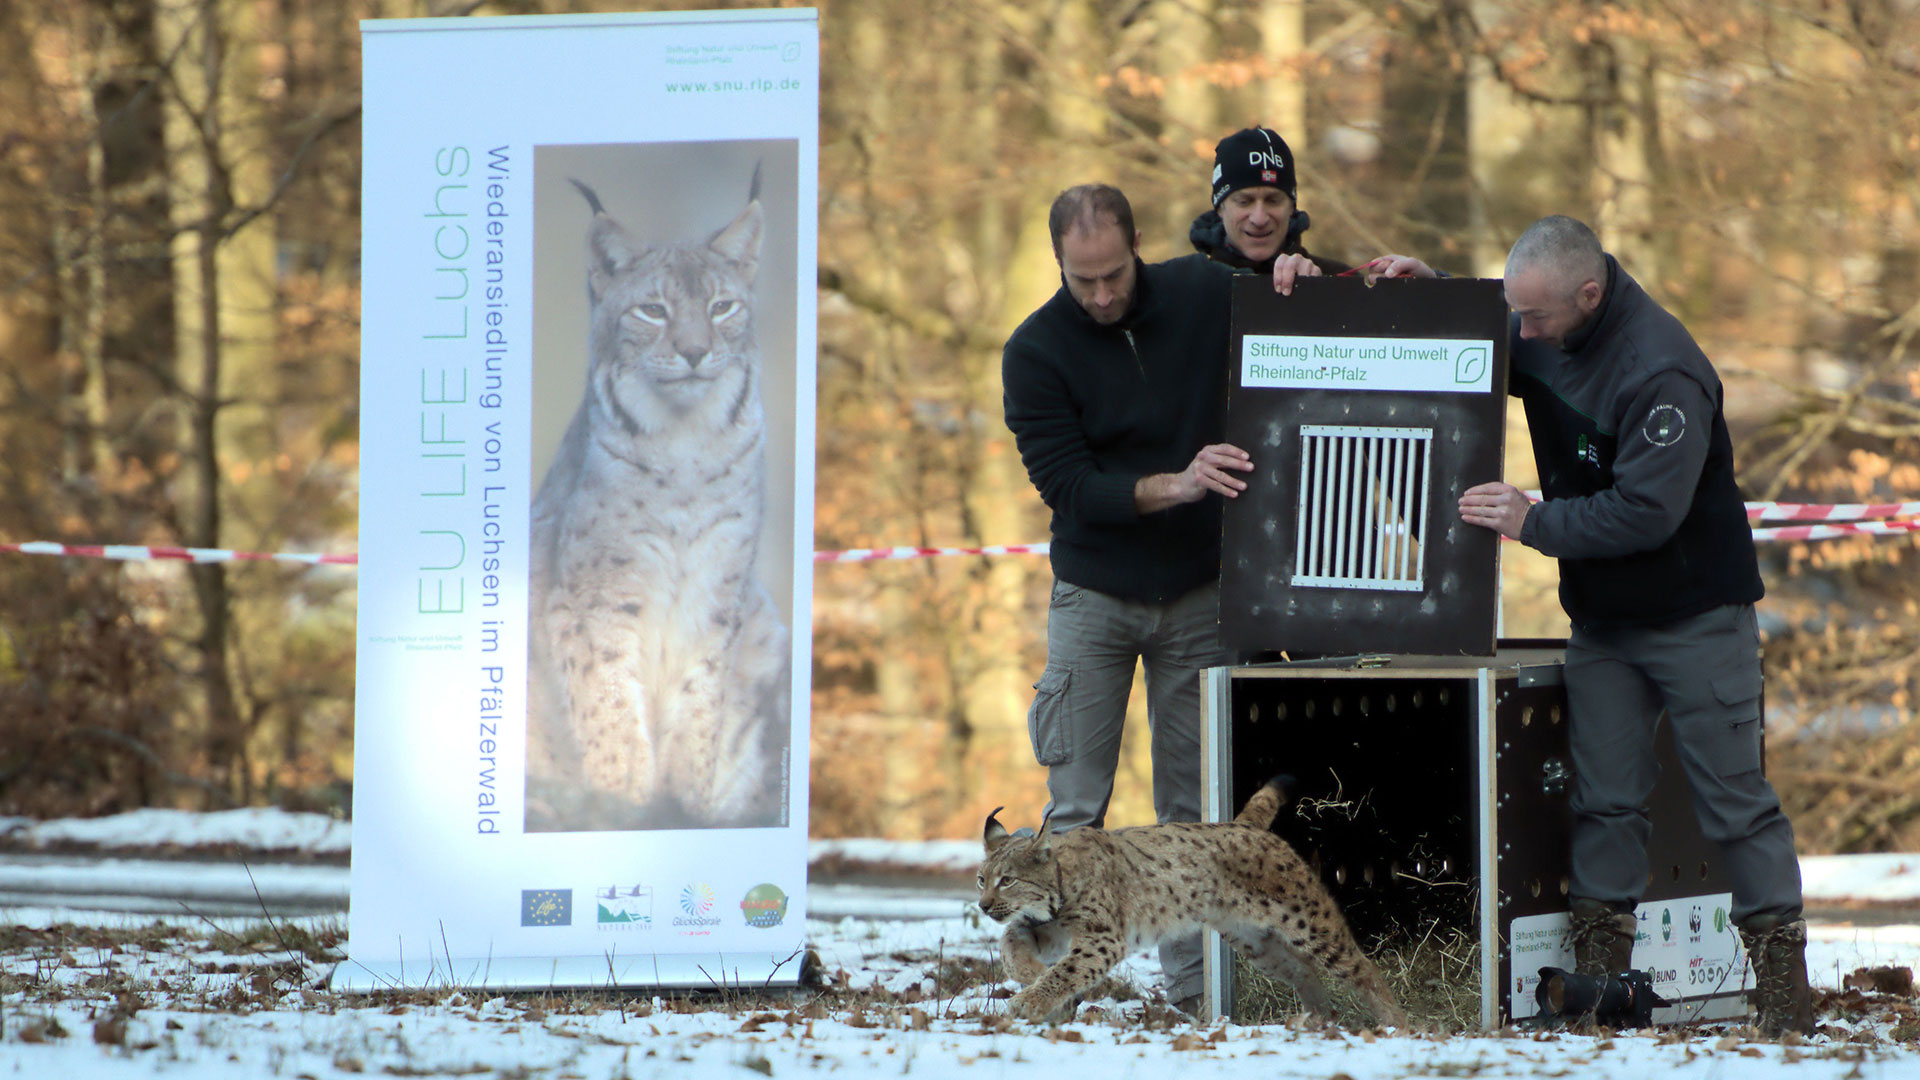 Freilassung der Luchsin Mala in der Pfalz am 6. Februar 2019